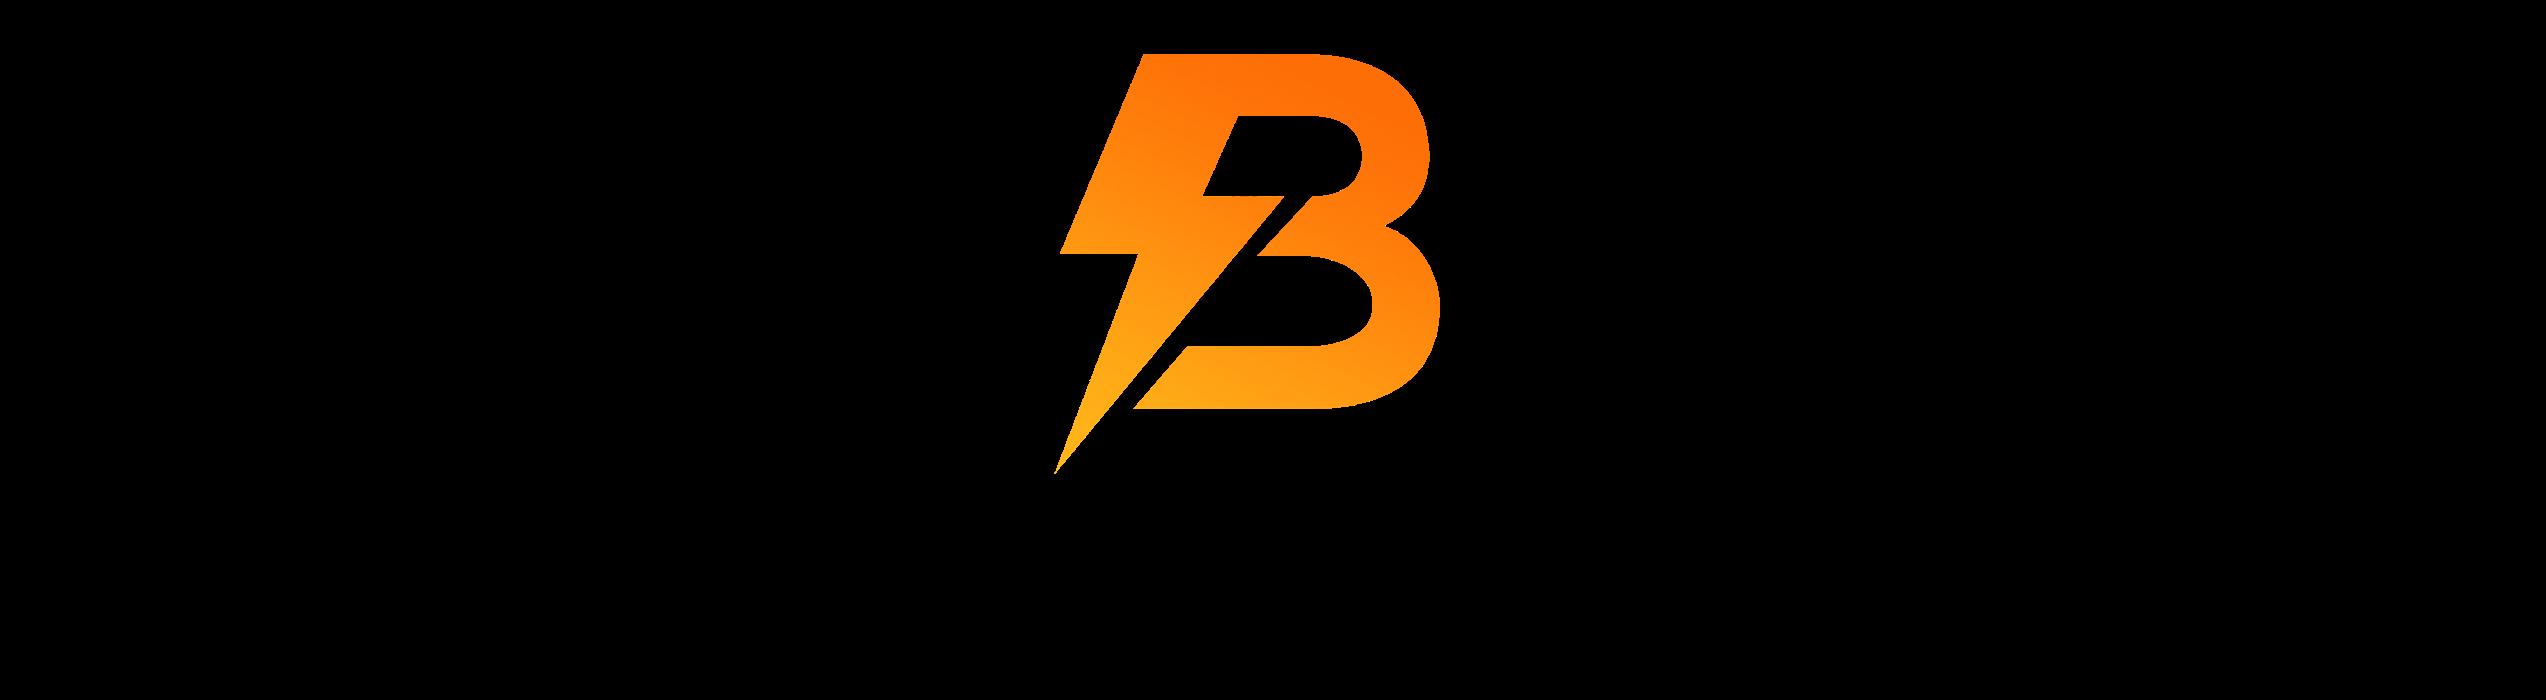 Bild zu Blitz Energie in Velbert